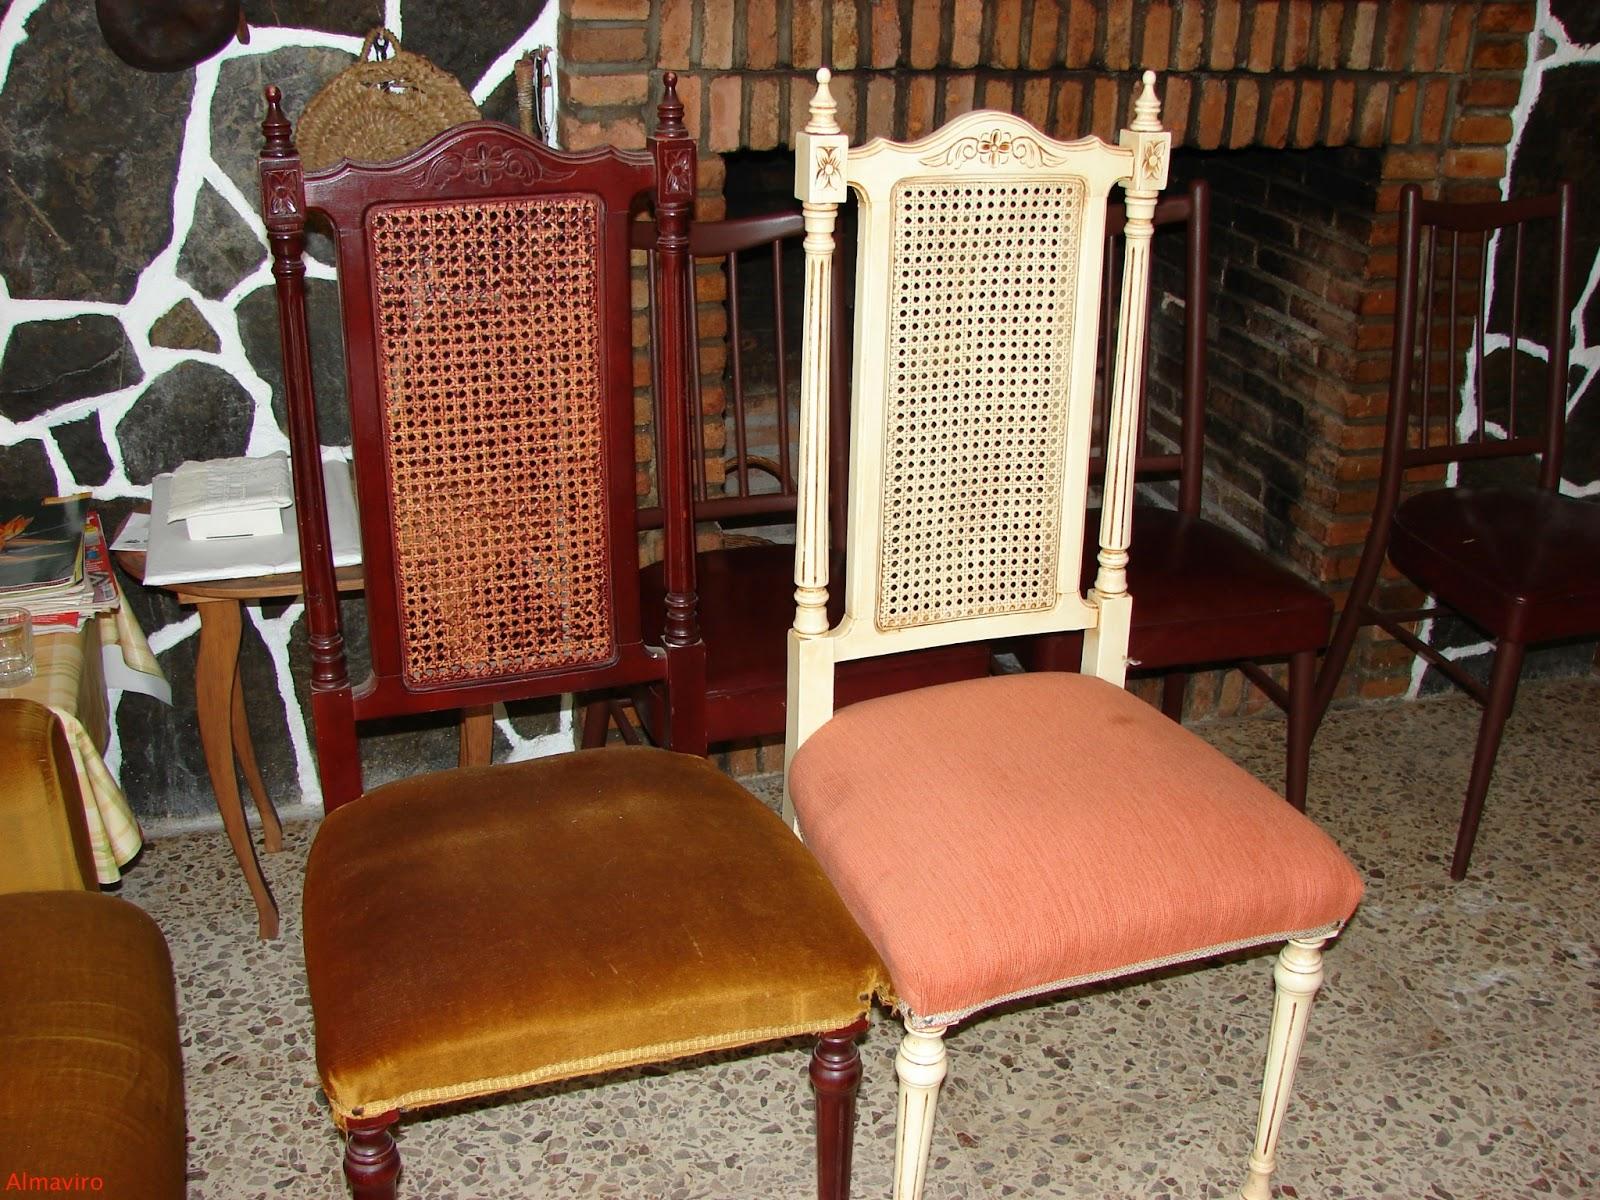 Almaviro sillas restauradas for Sillas antiguas restauradas